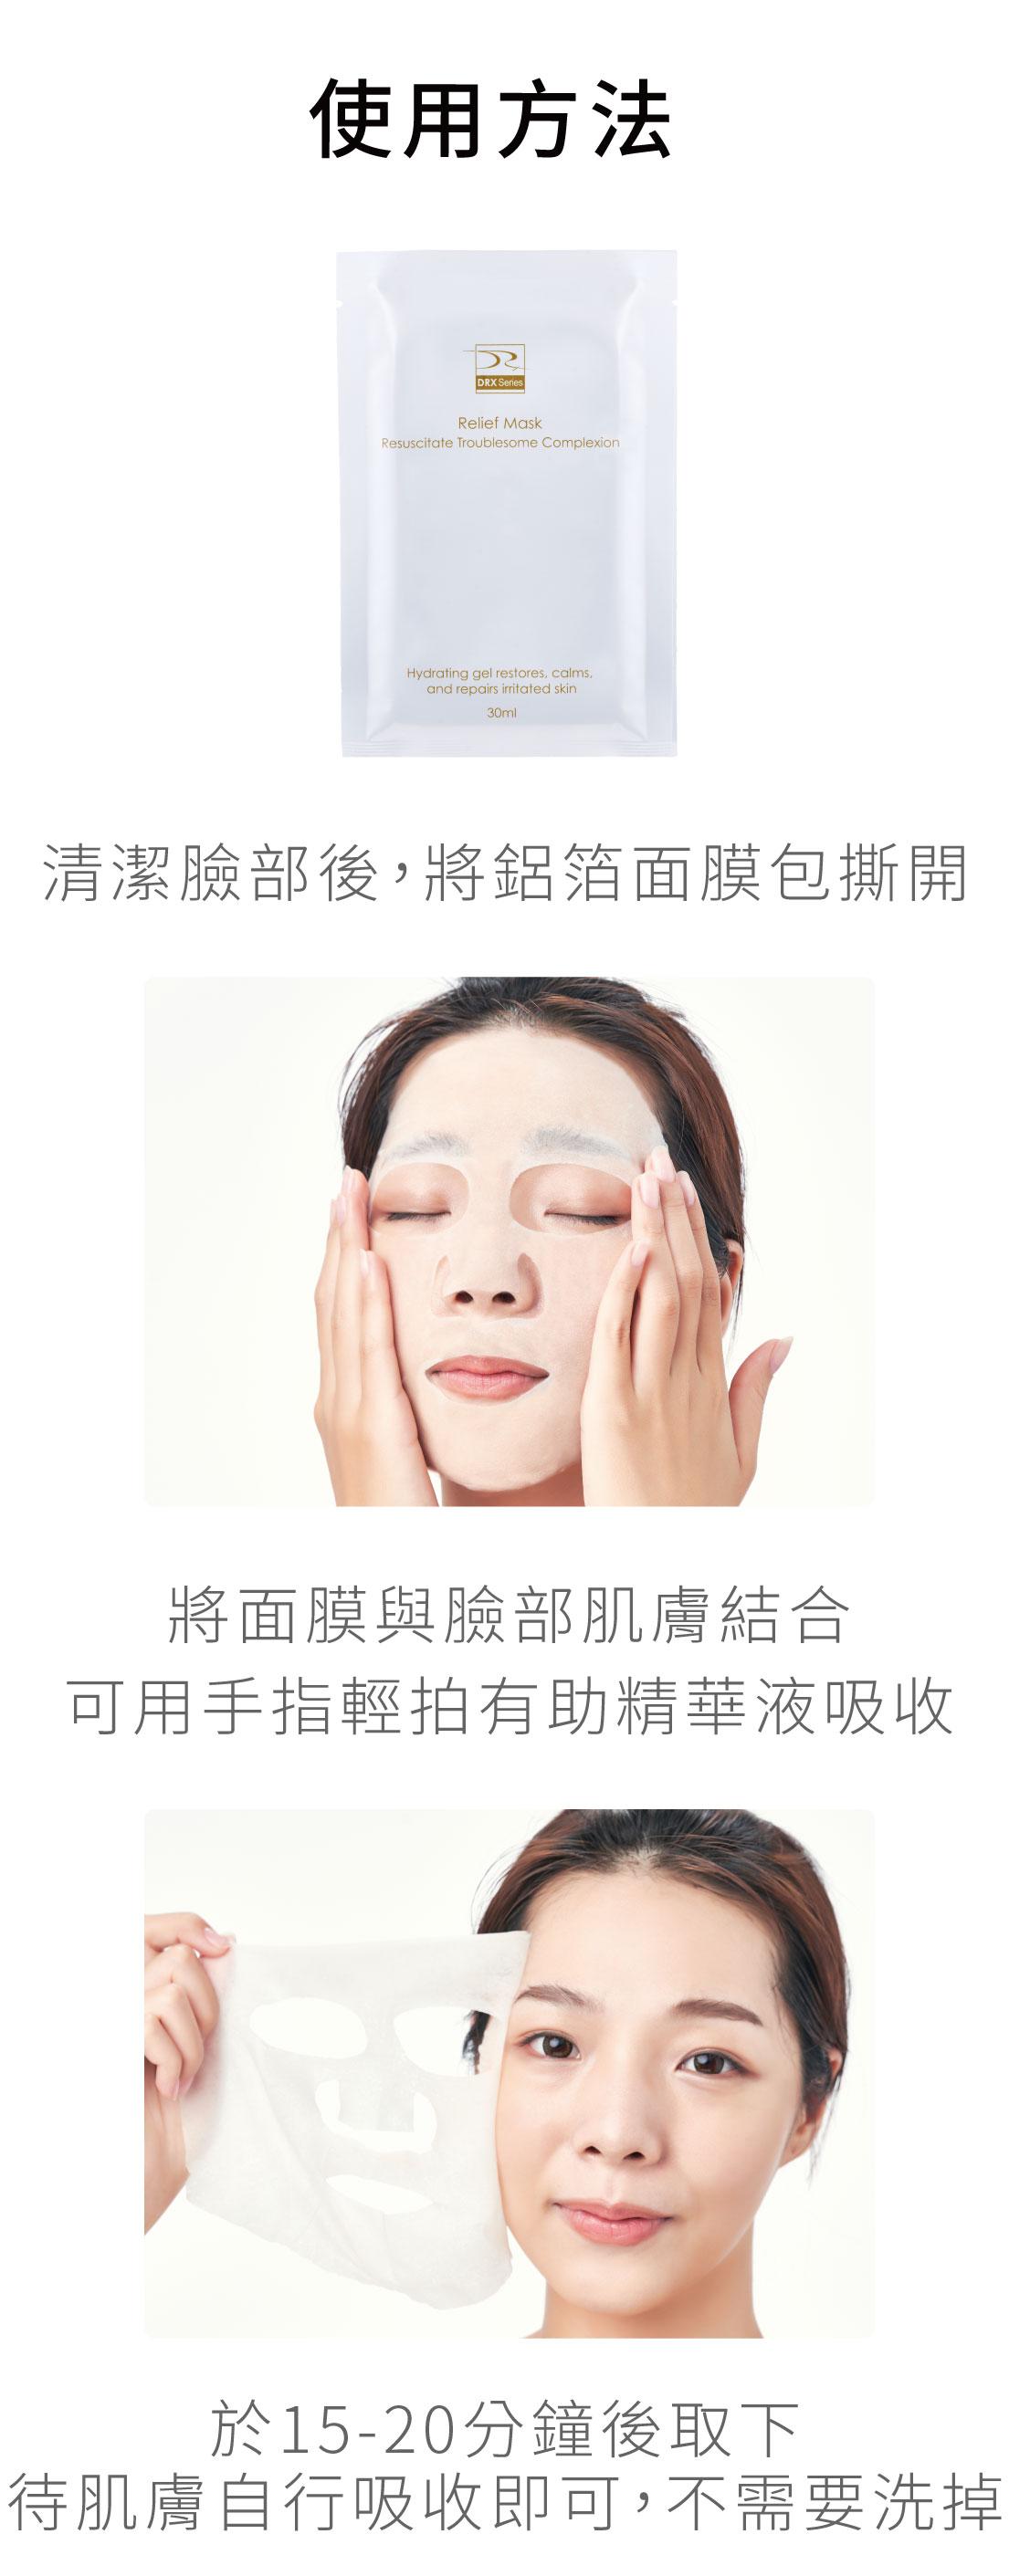 DRX達特仕給您最好的煥膚產品,DRX達特仕的DRX居家煥膚PRO版,是你居家煥膚的好幫手,在家就可以得到像水飛梭或A醇煥膚一樣的皮膚護理,幫你改善膚質及毛孔、皮膚美白超有感!